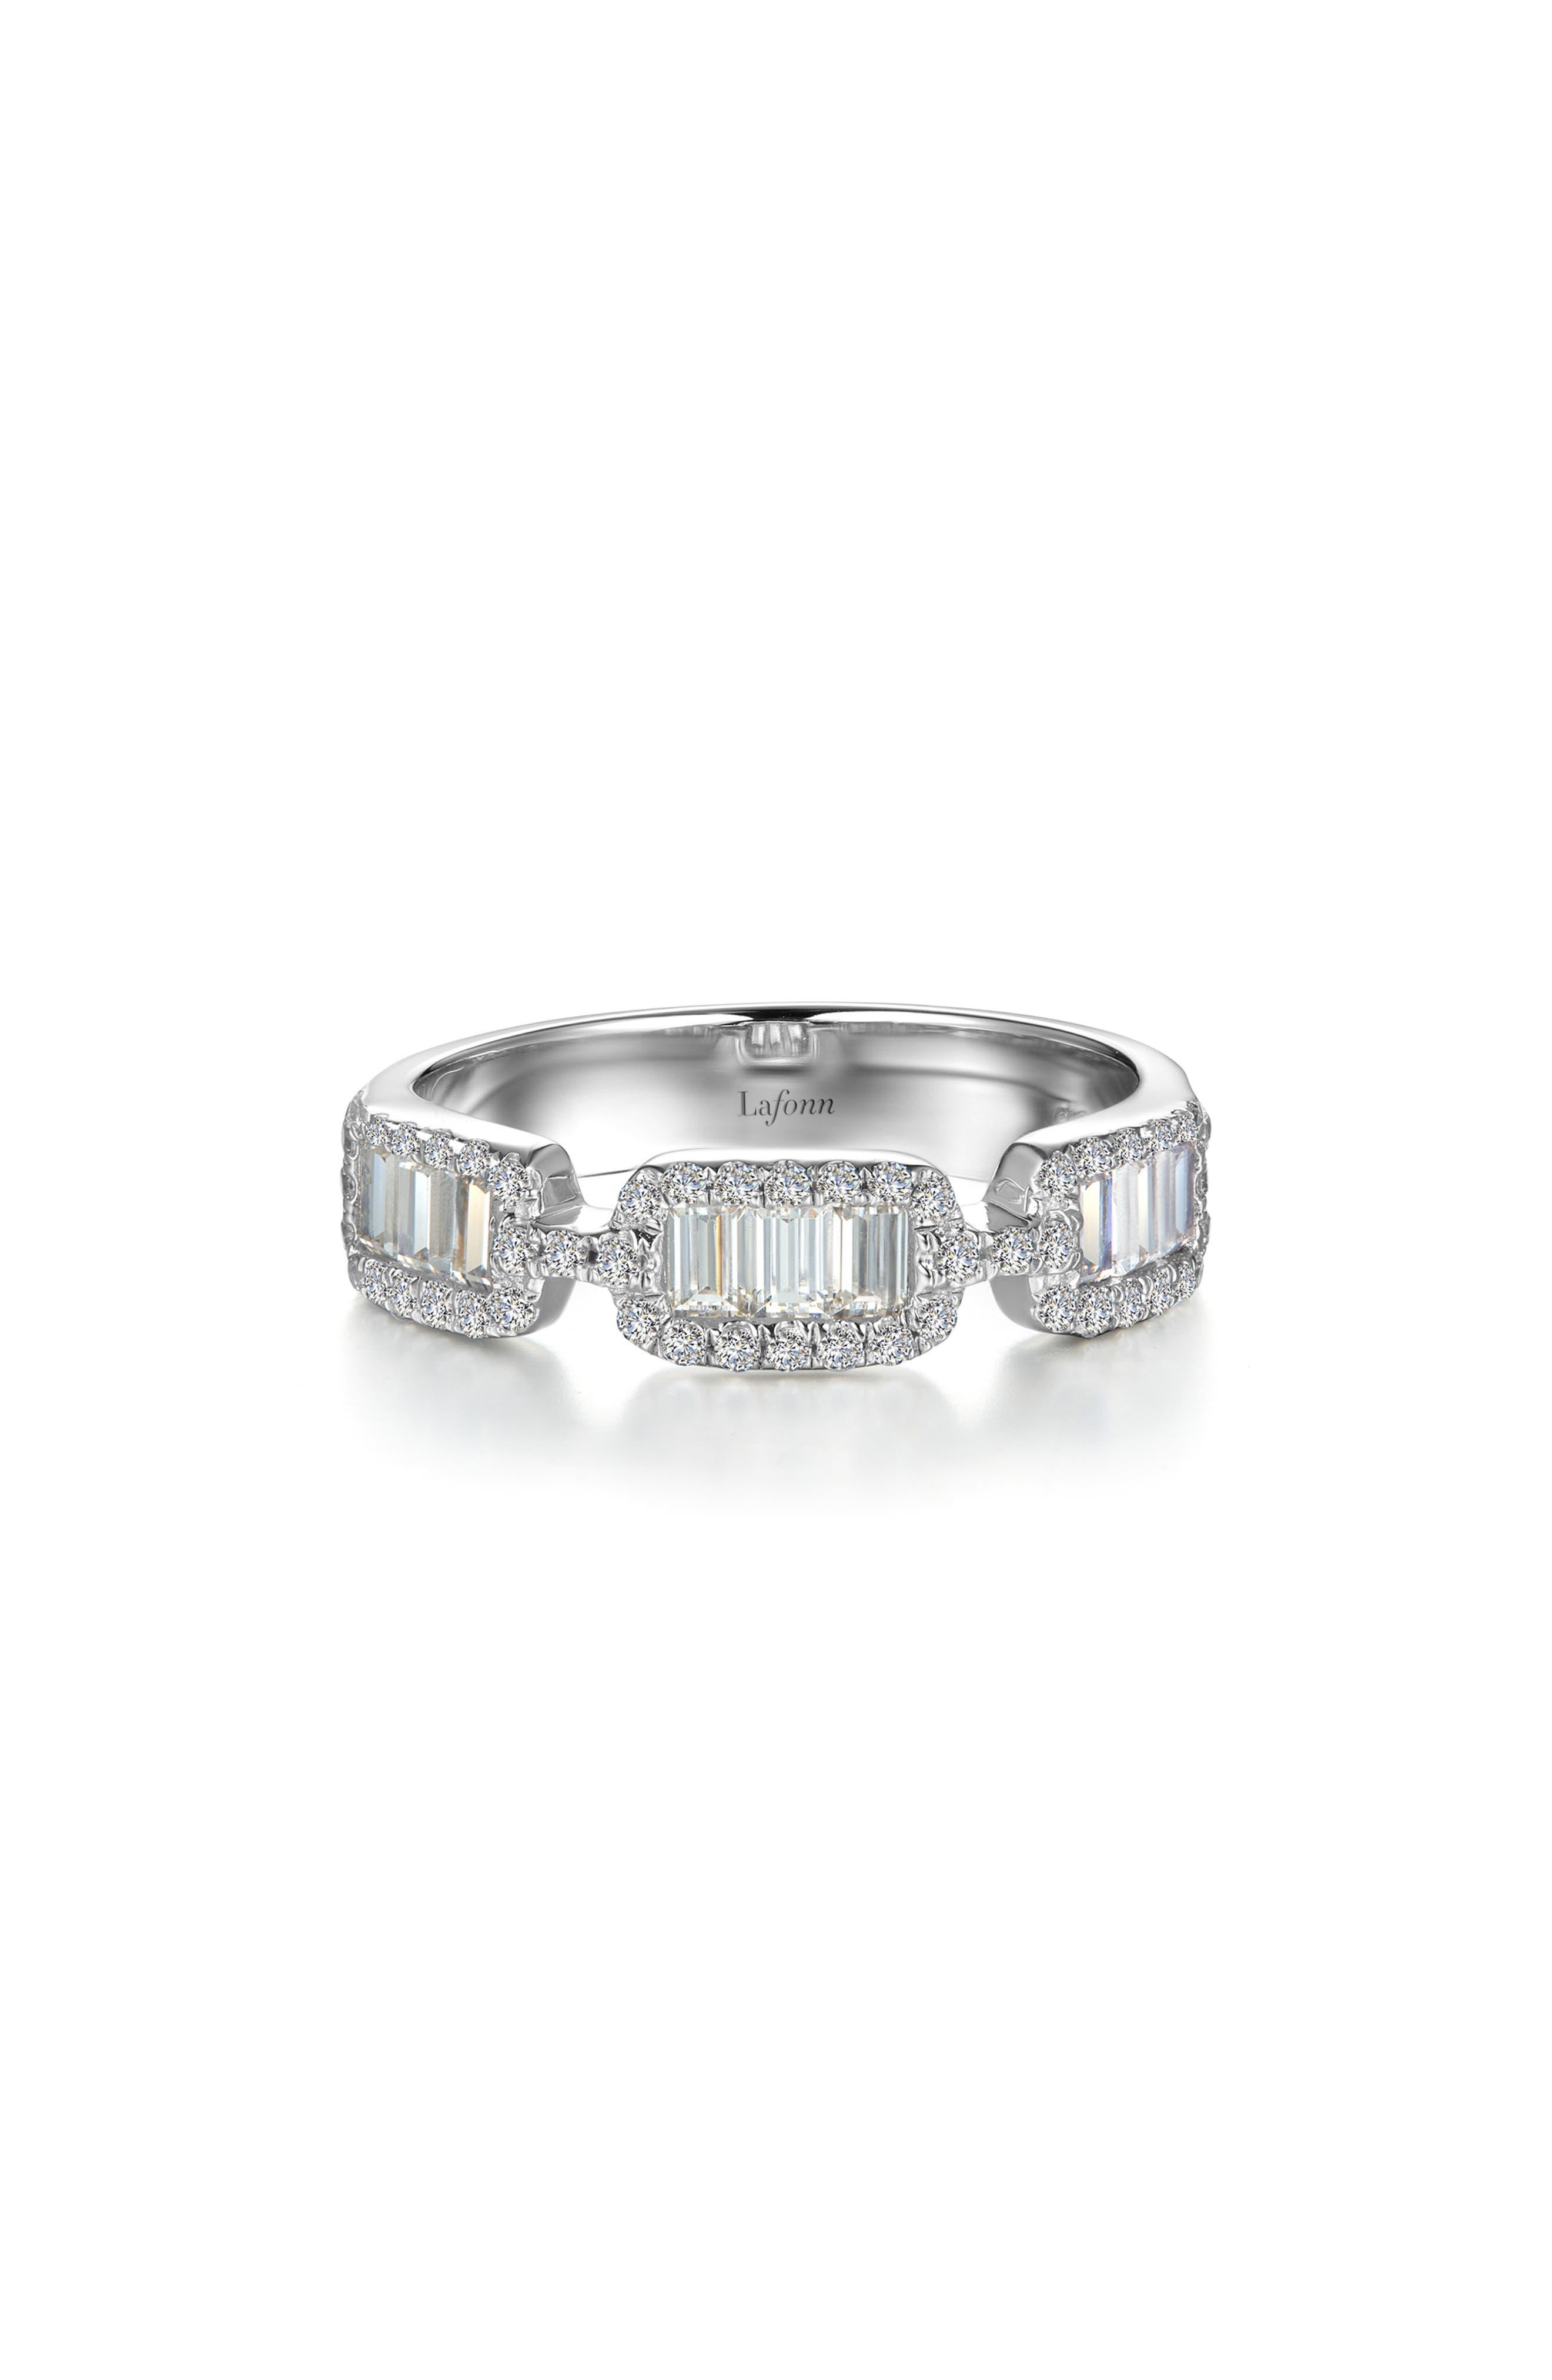 Half-Eternity Baguette Ring